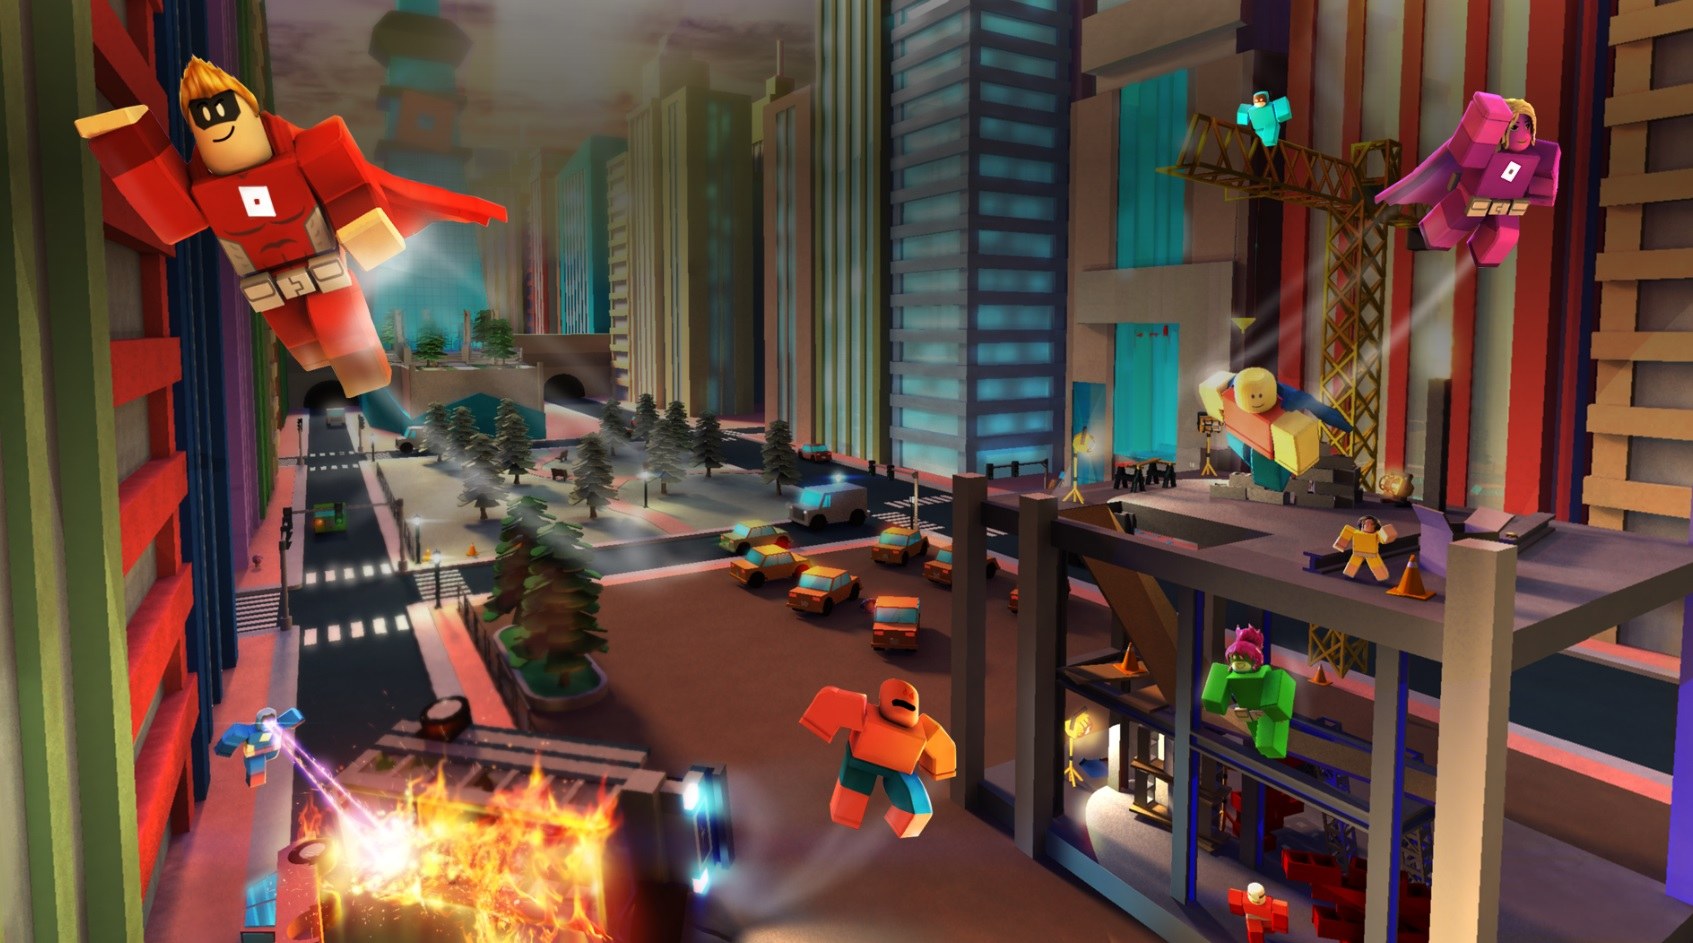 Roblox Raises 150 Million As Its User Created Game World Surpasses